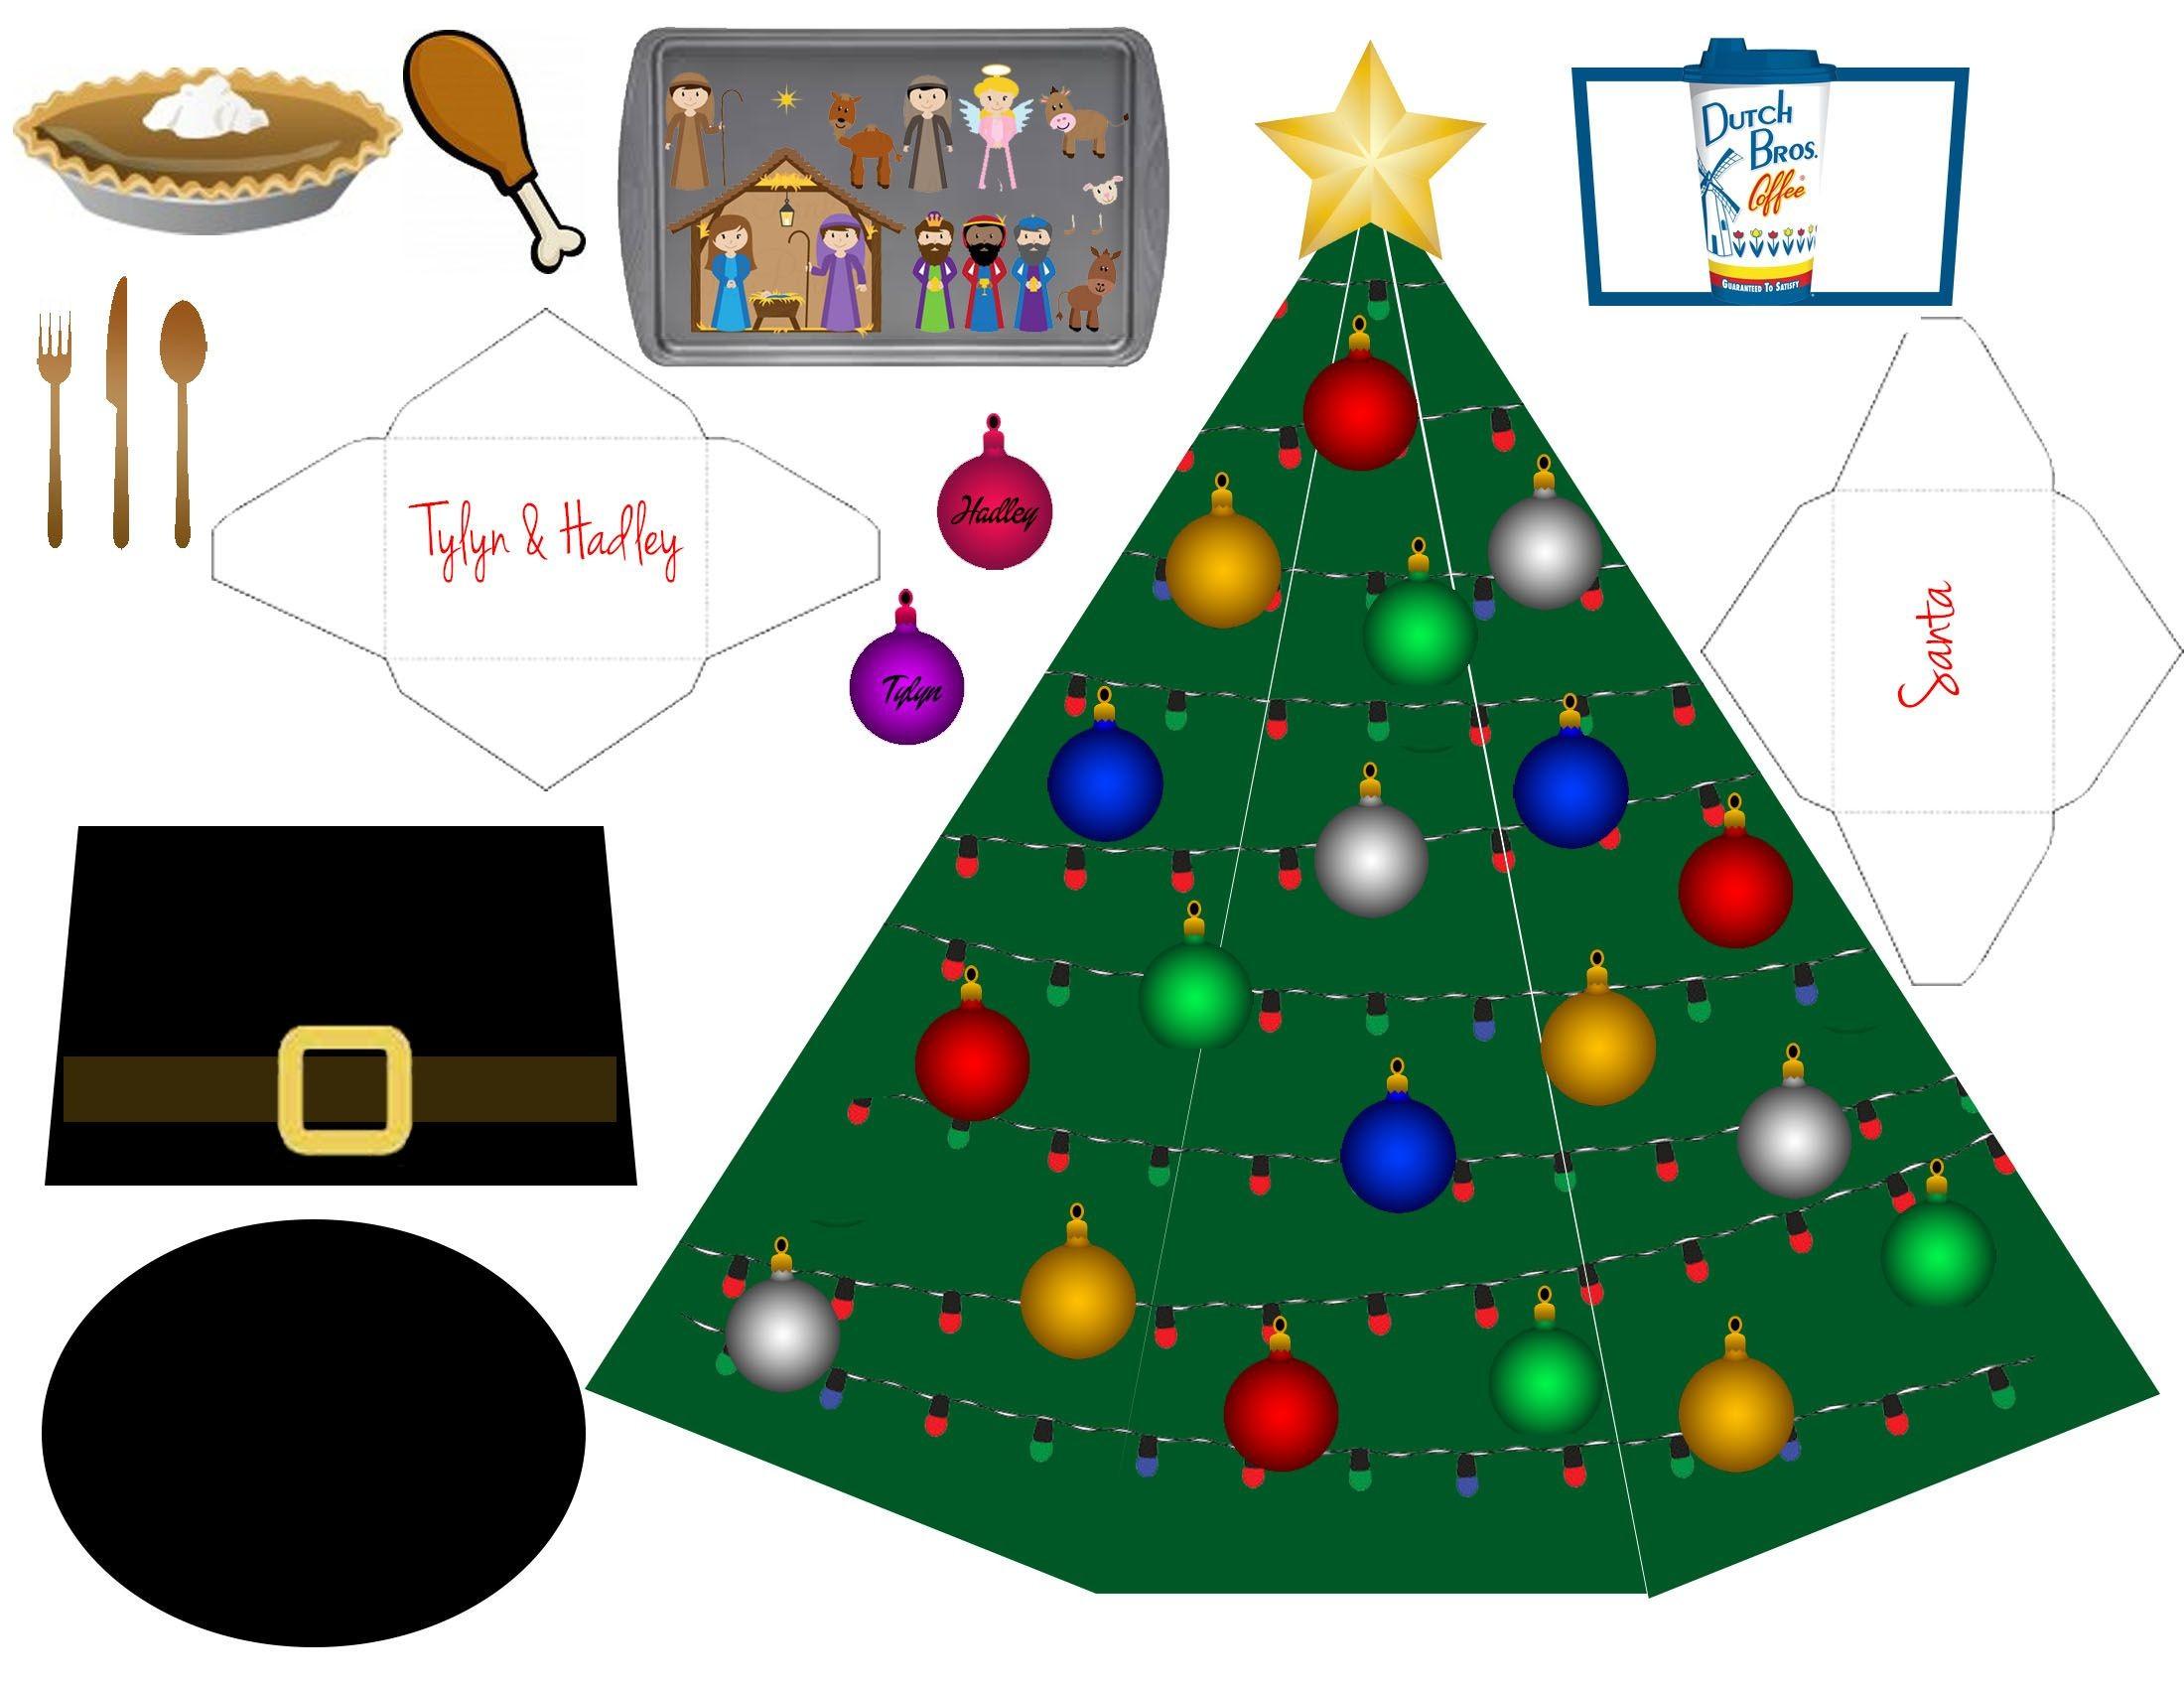 Printable Christmas Decorations Cutouts Newchristmas Co. Printable - Free Printable Christmas Cutouts